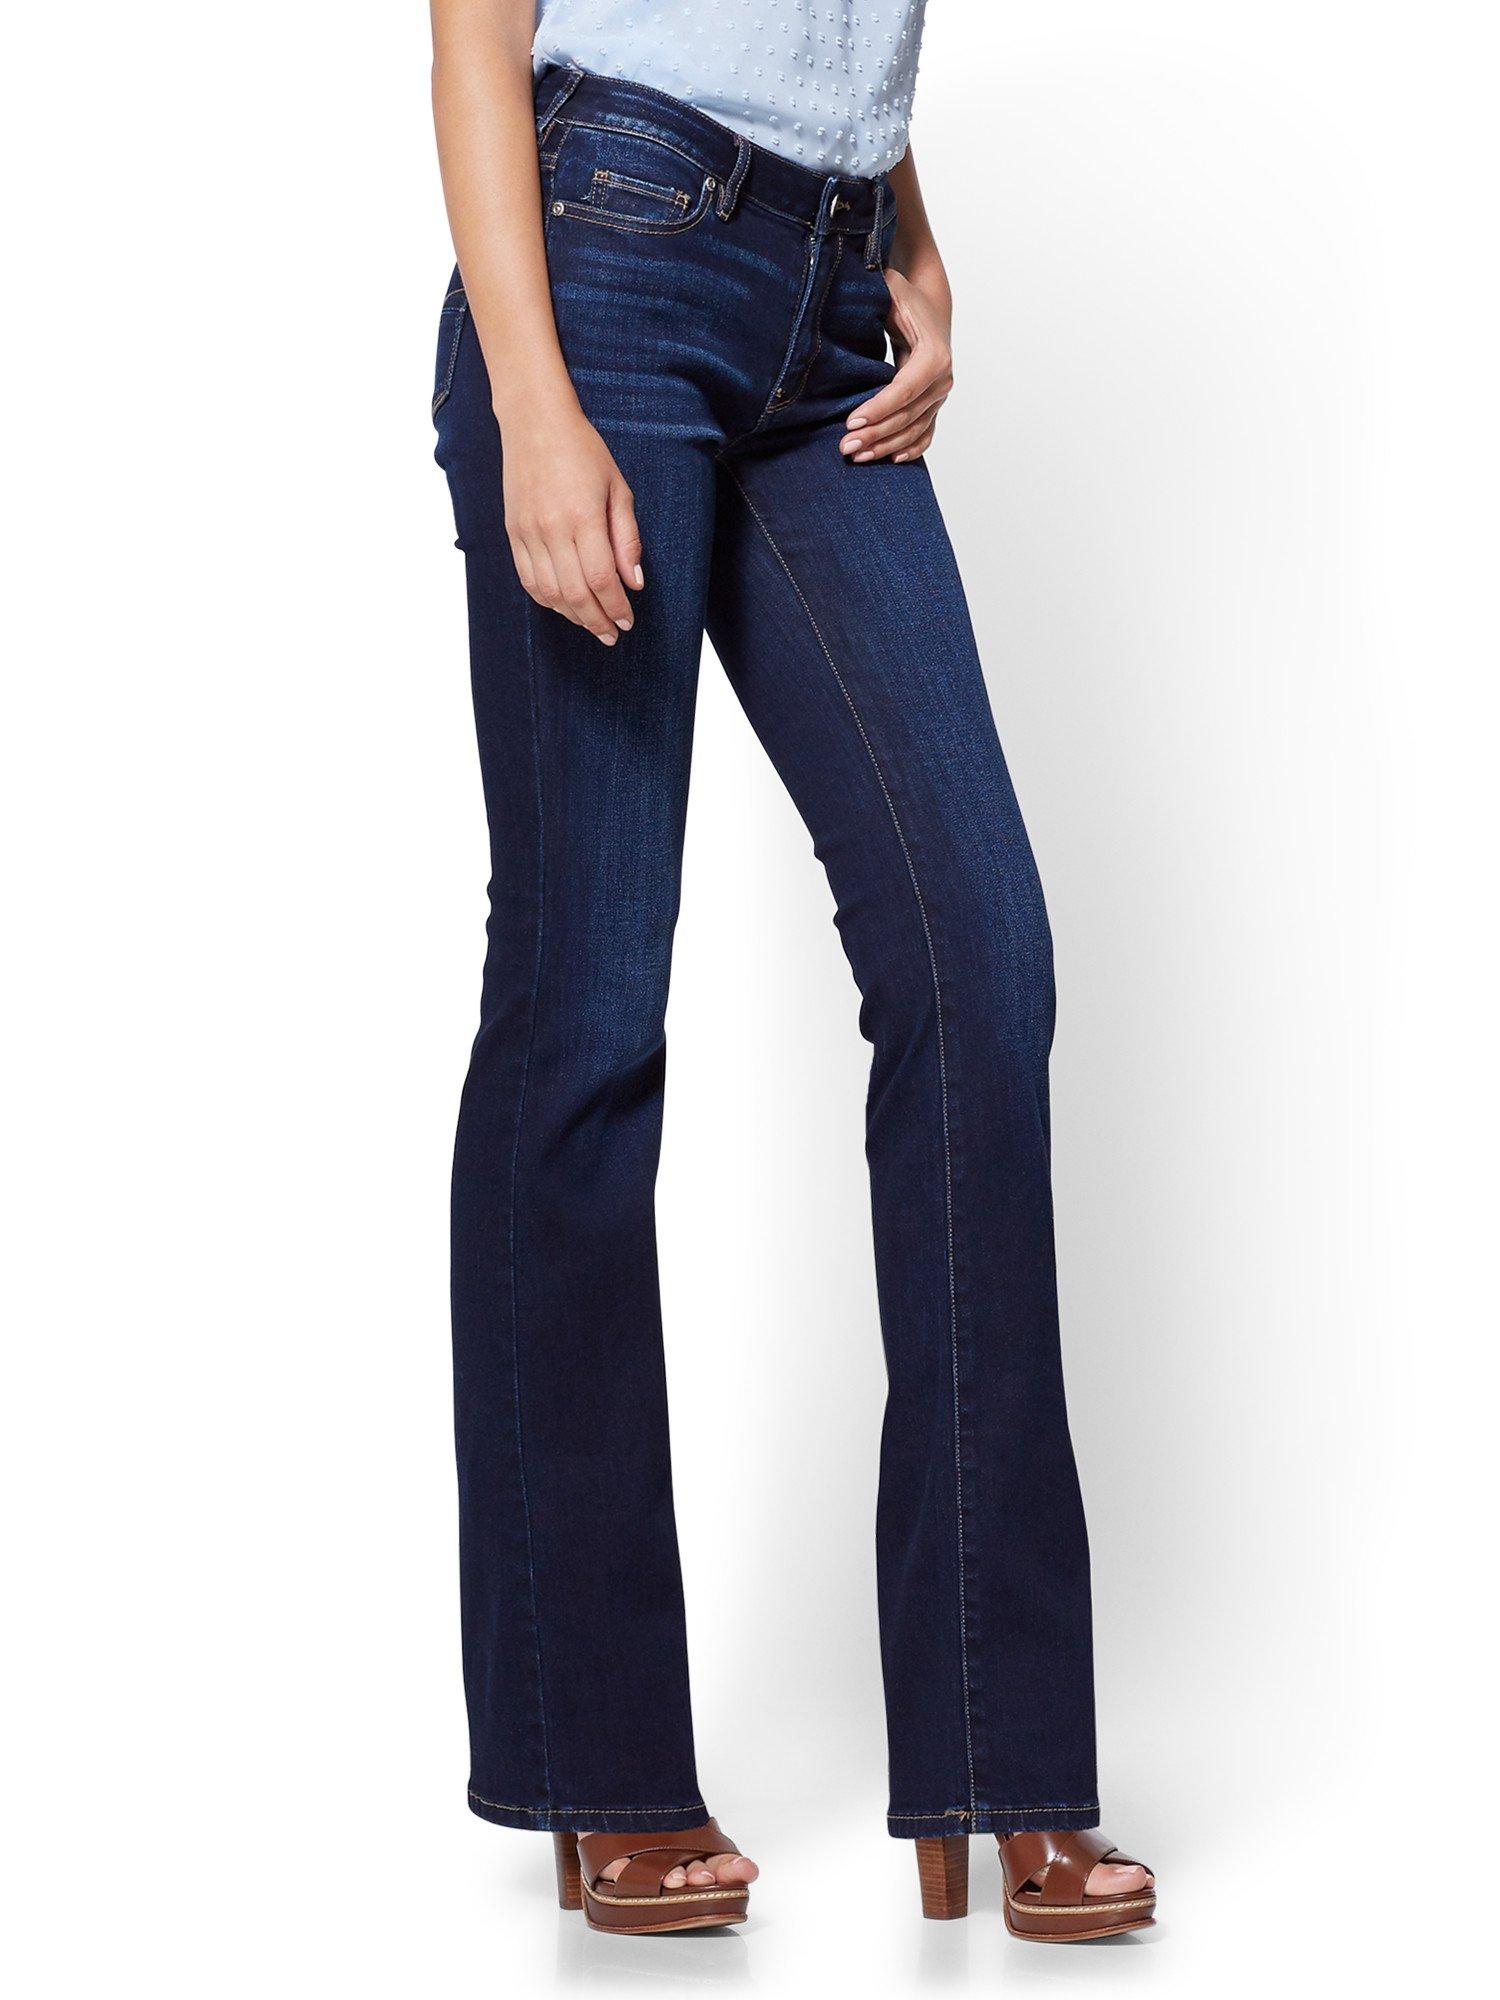 New York & Co. Women's Soho Jeans - Petite Curvy Bootcut 4 Blue Tease Wash